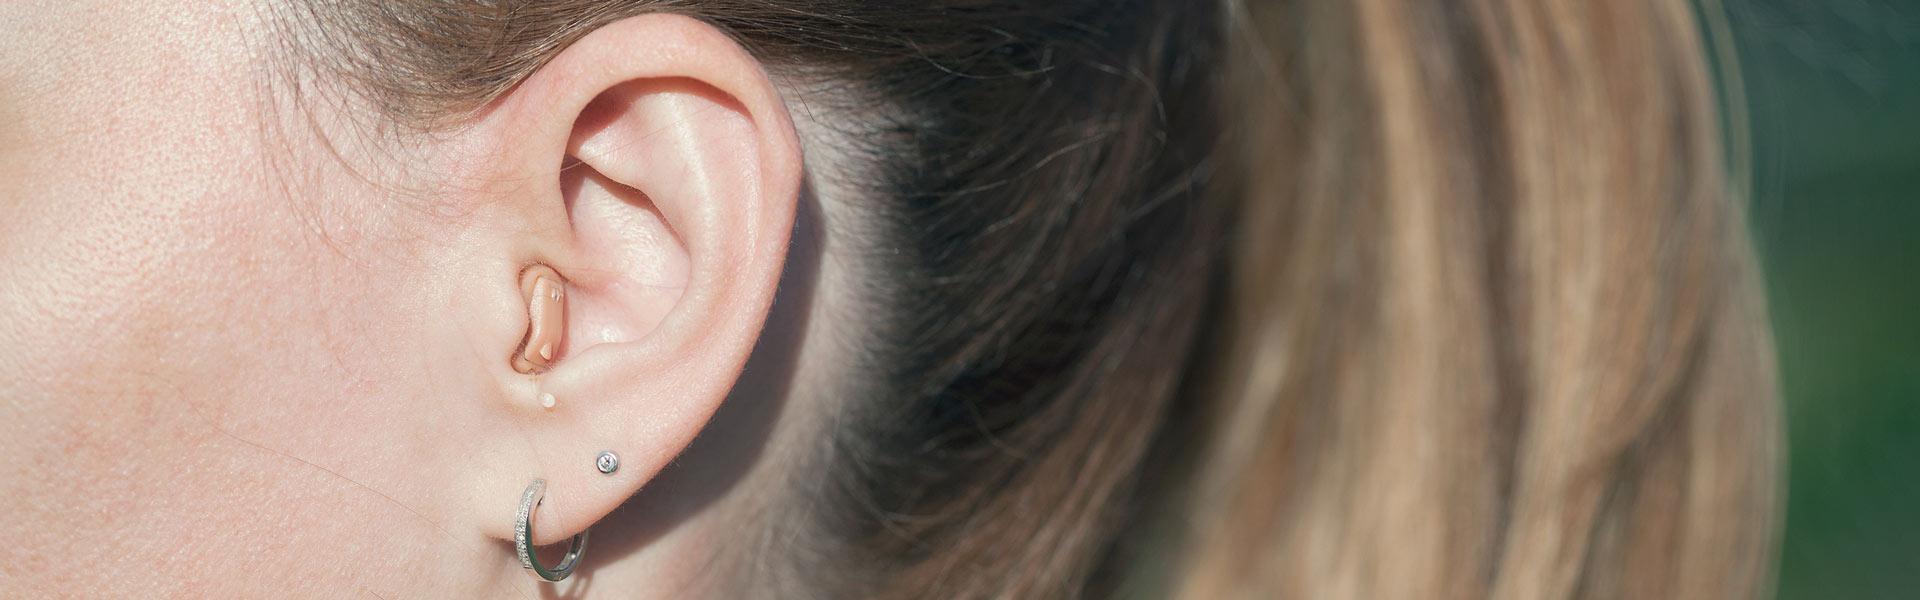 Best-digital-hearing-aid-ever